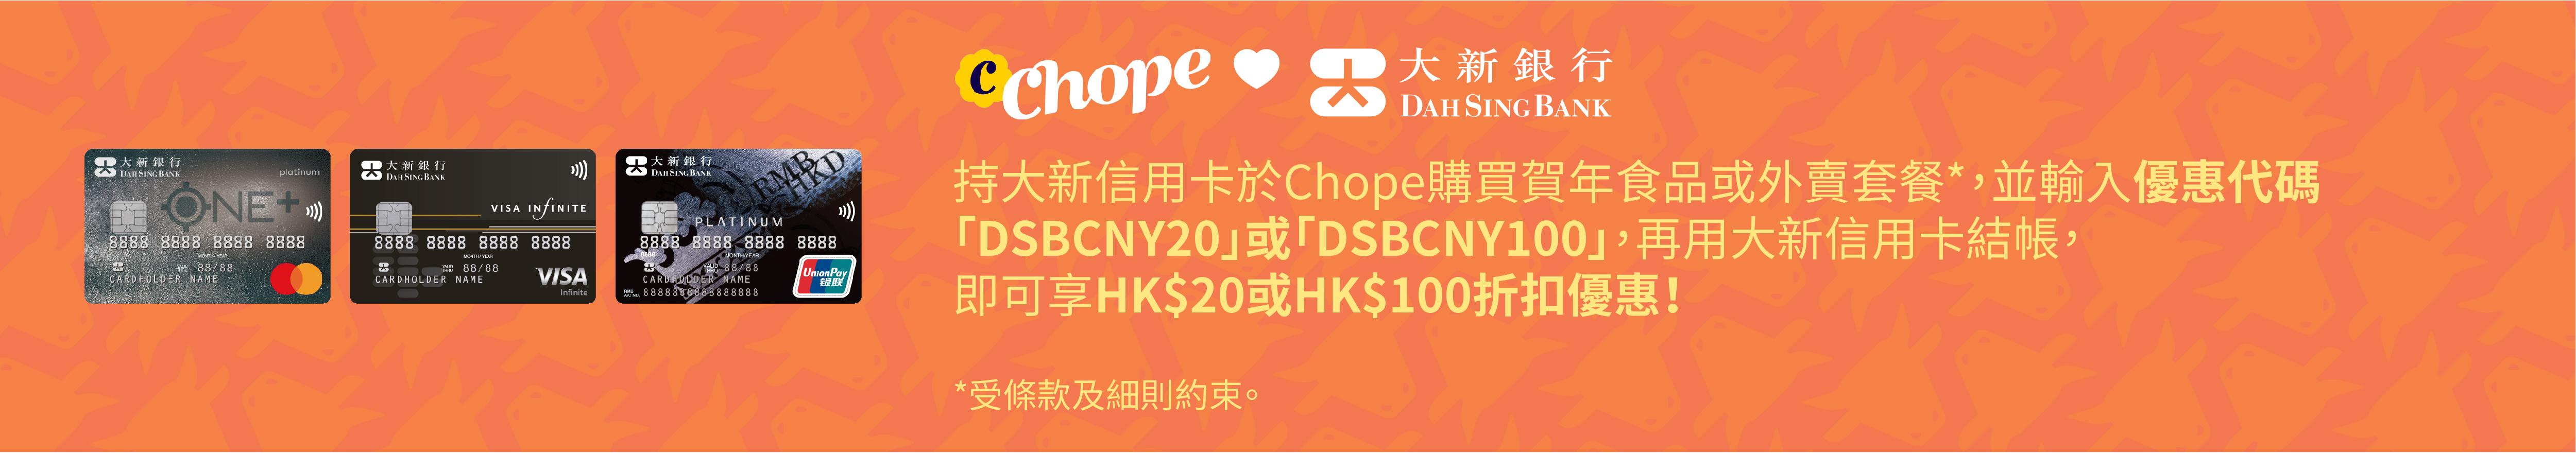 Chope x Dah Sing Bank Offer